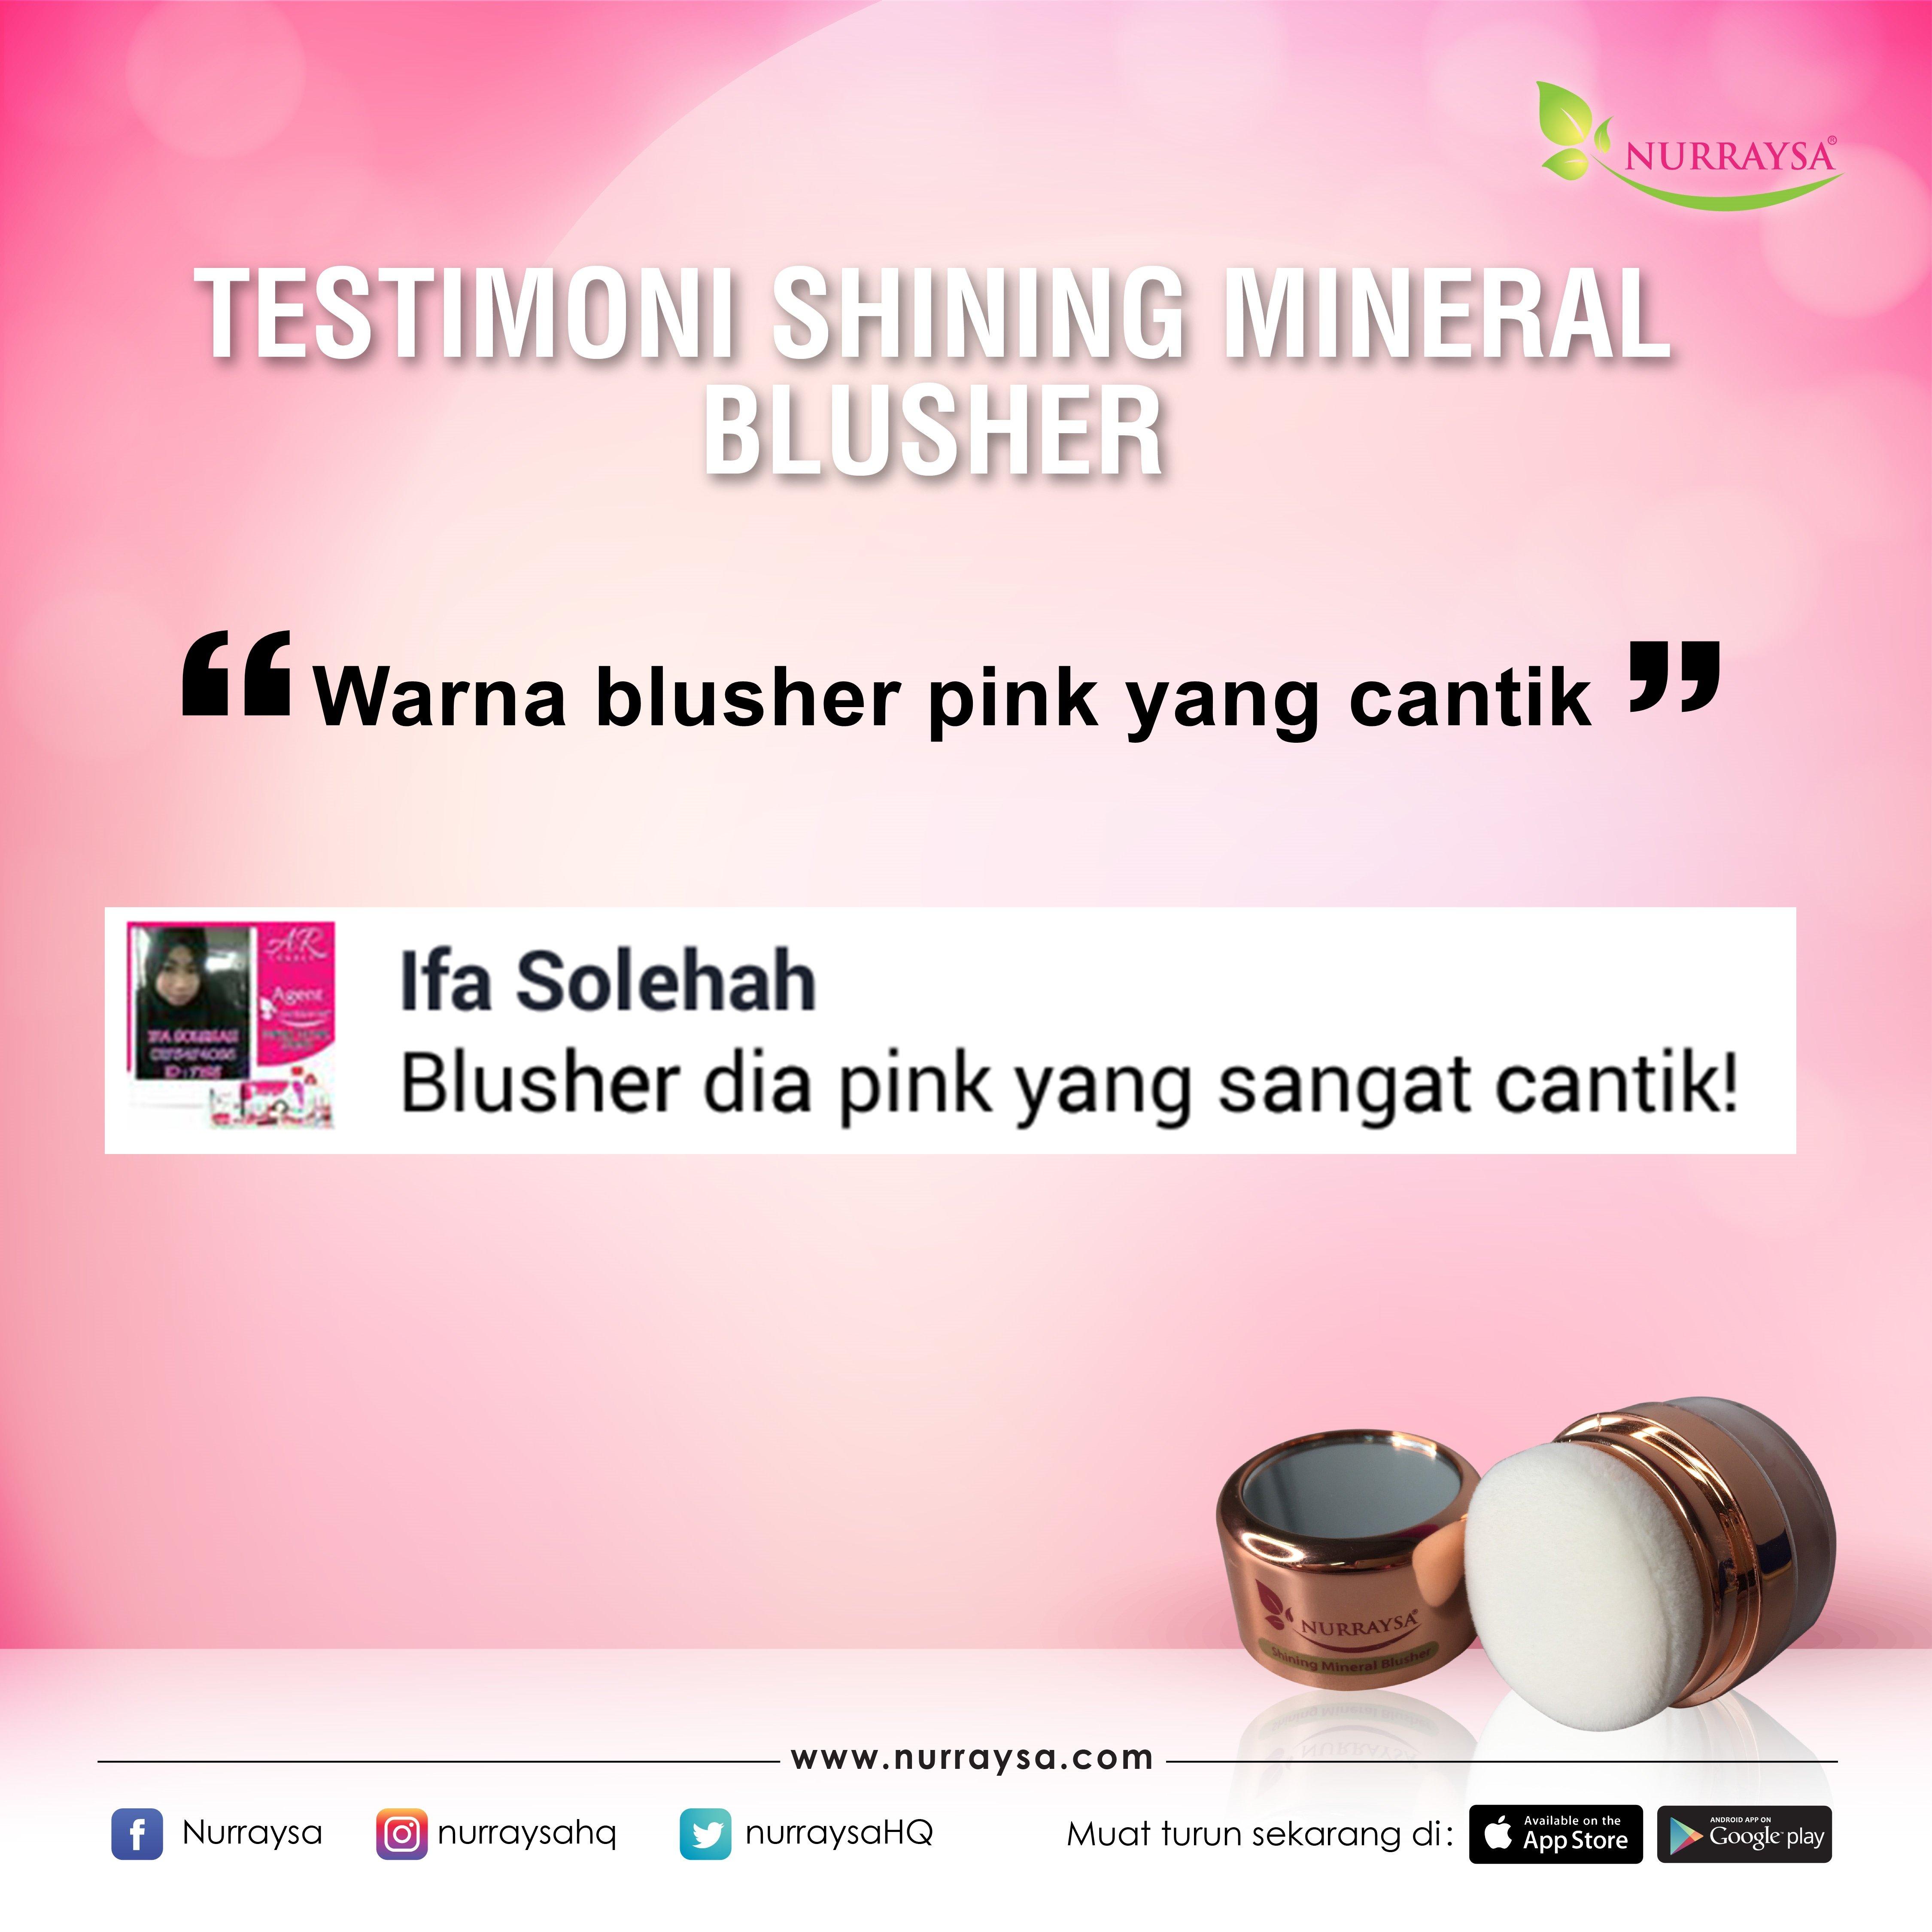 Testimoni Mineral Blusher 2